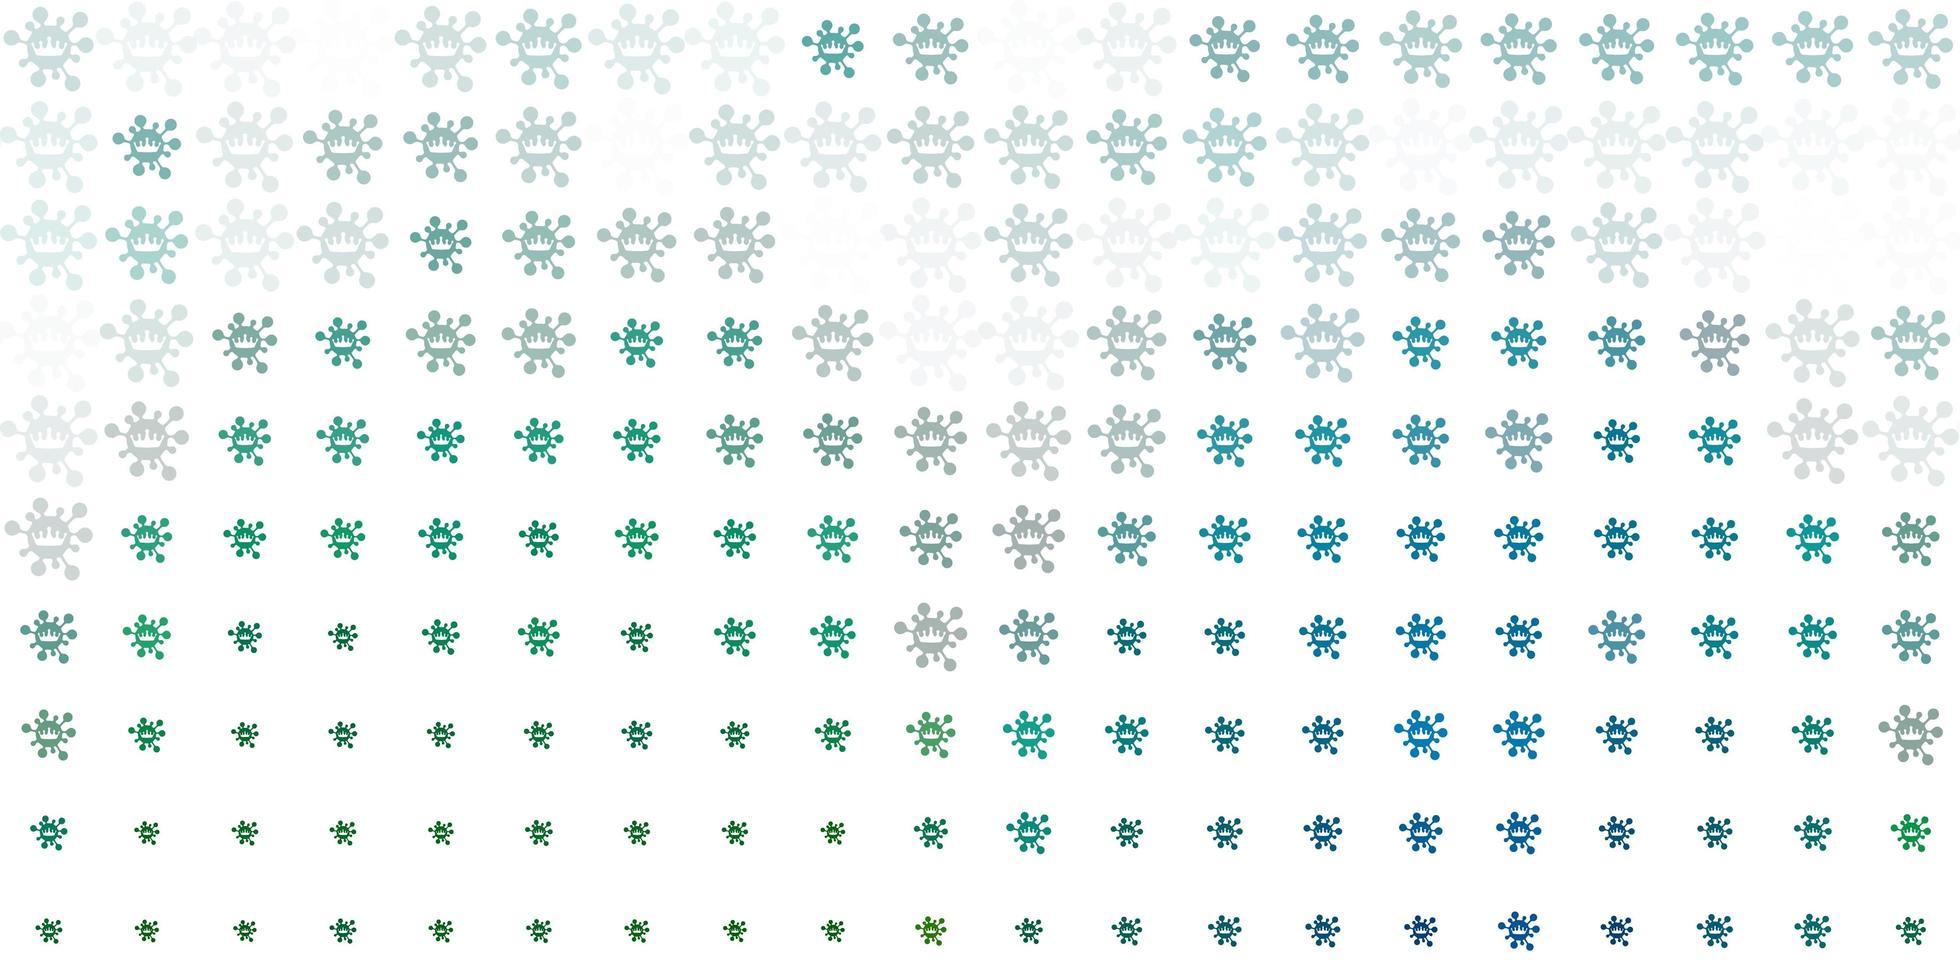 Light Green vector backdrop with virus symbols